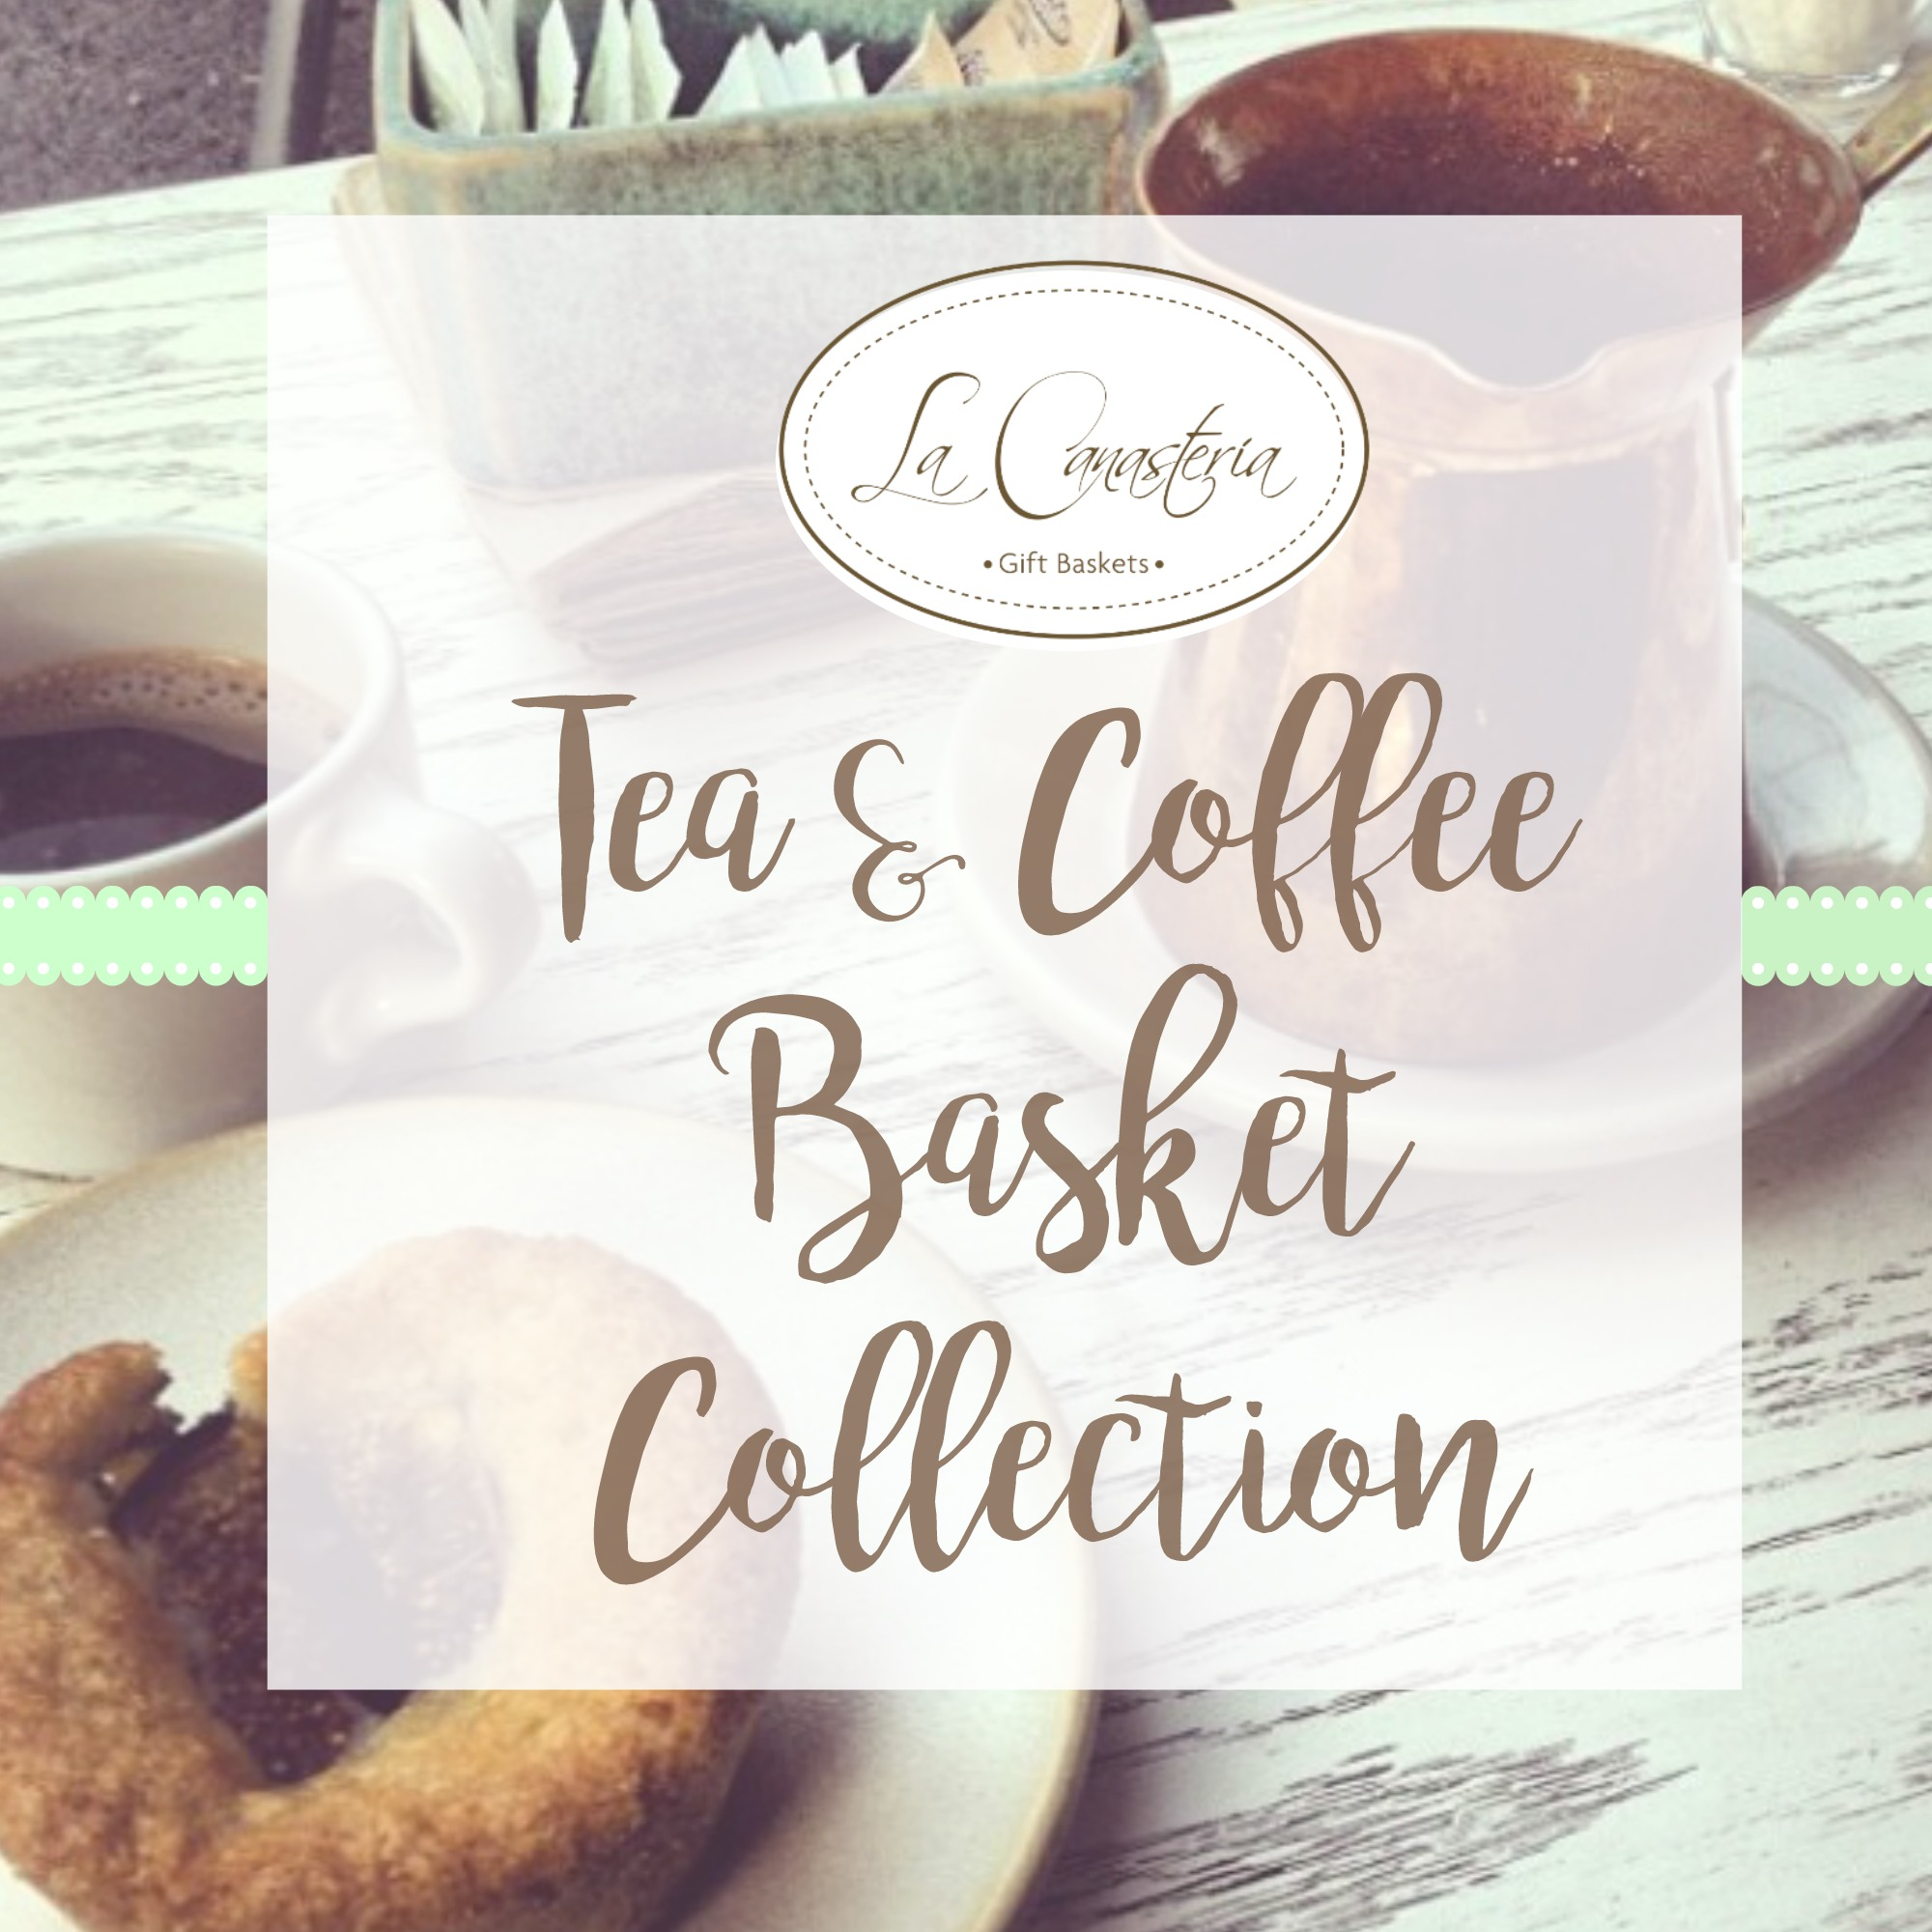 FacebookAlbumCoverTea&coffeeBasketjpg